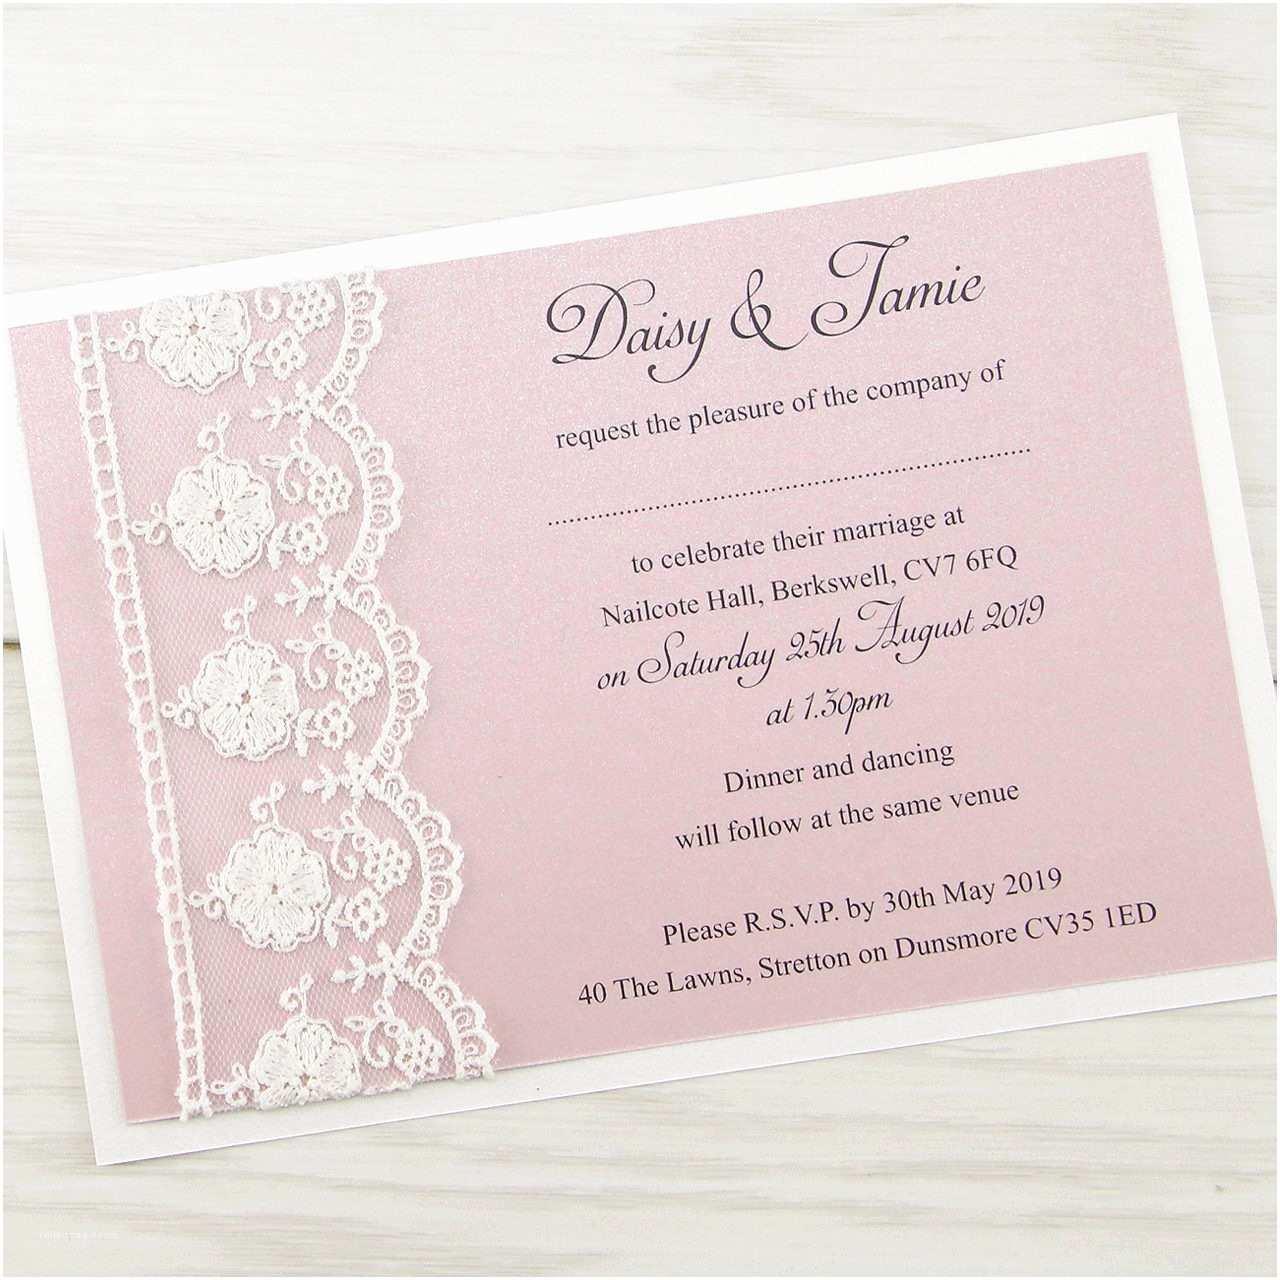 Shutterfly Beach Wedding Invitations Invitations Inexpensive Wedding Invitations for Fancy